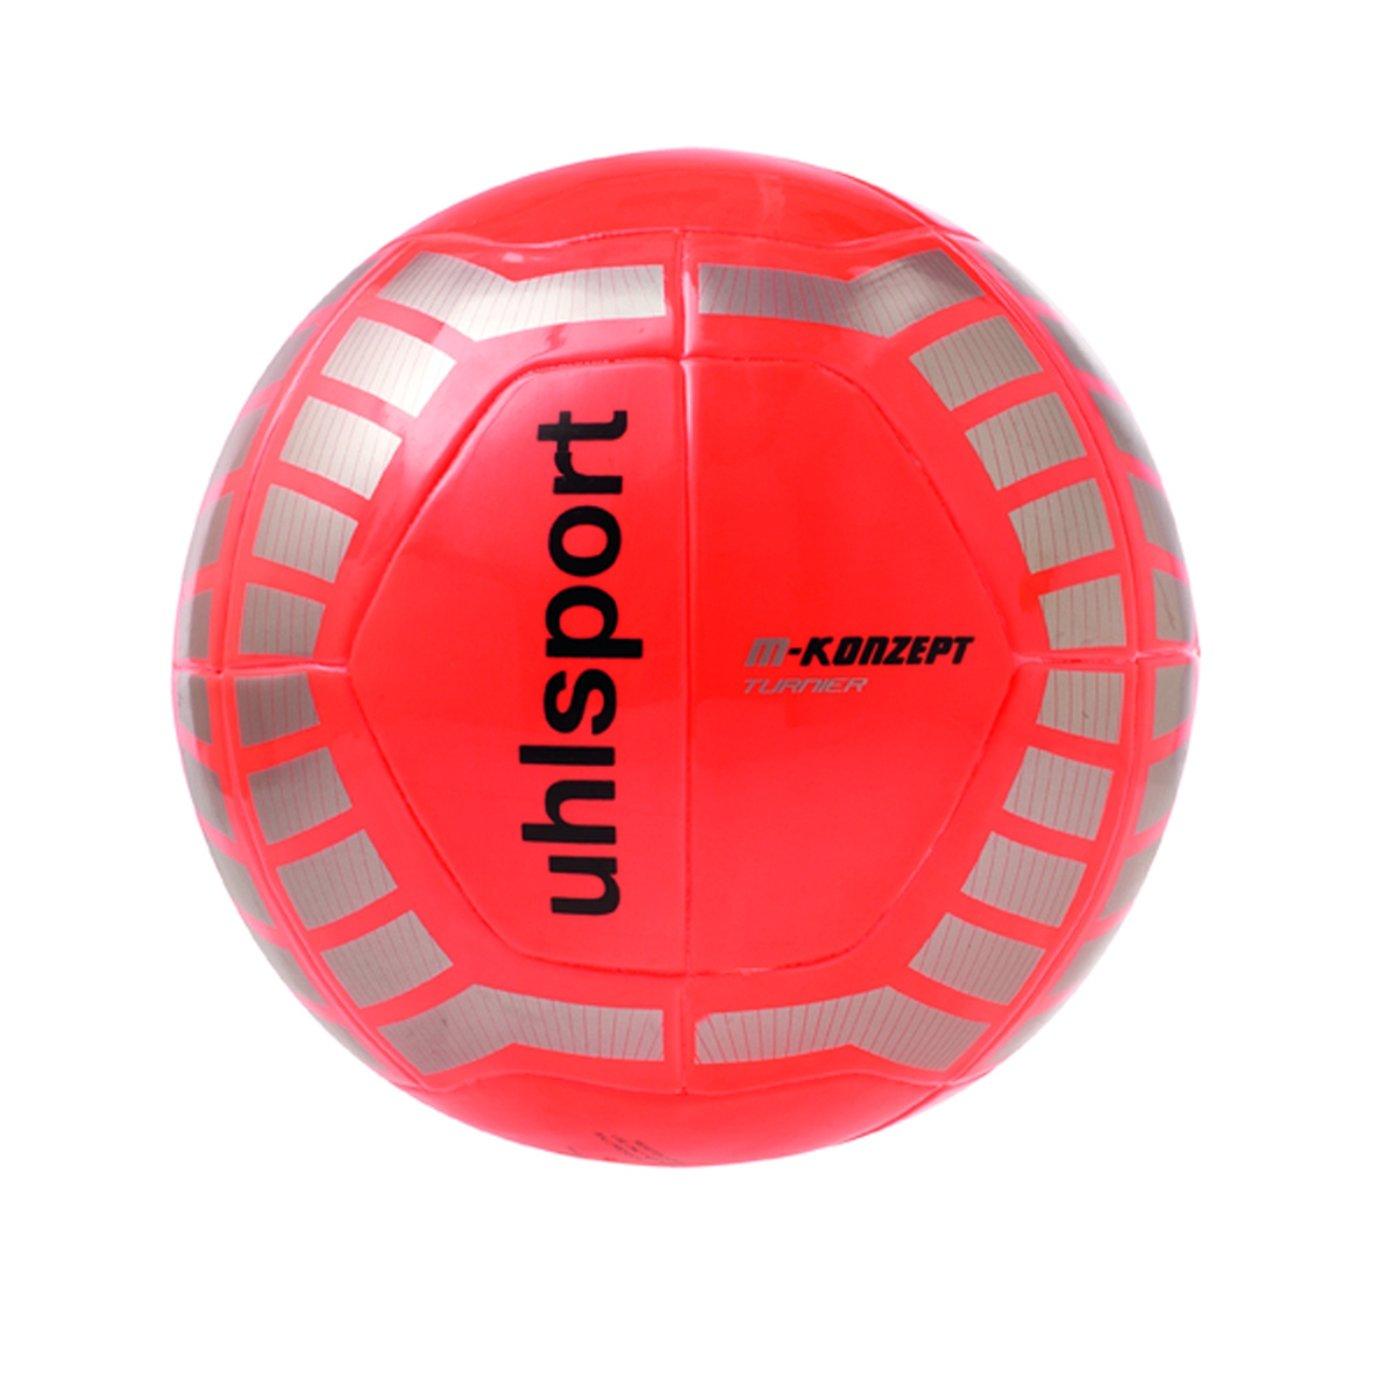 Uhlsport M-konzept Turnier - Balón naranja orange/silber/schwarz ...